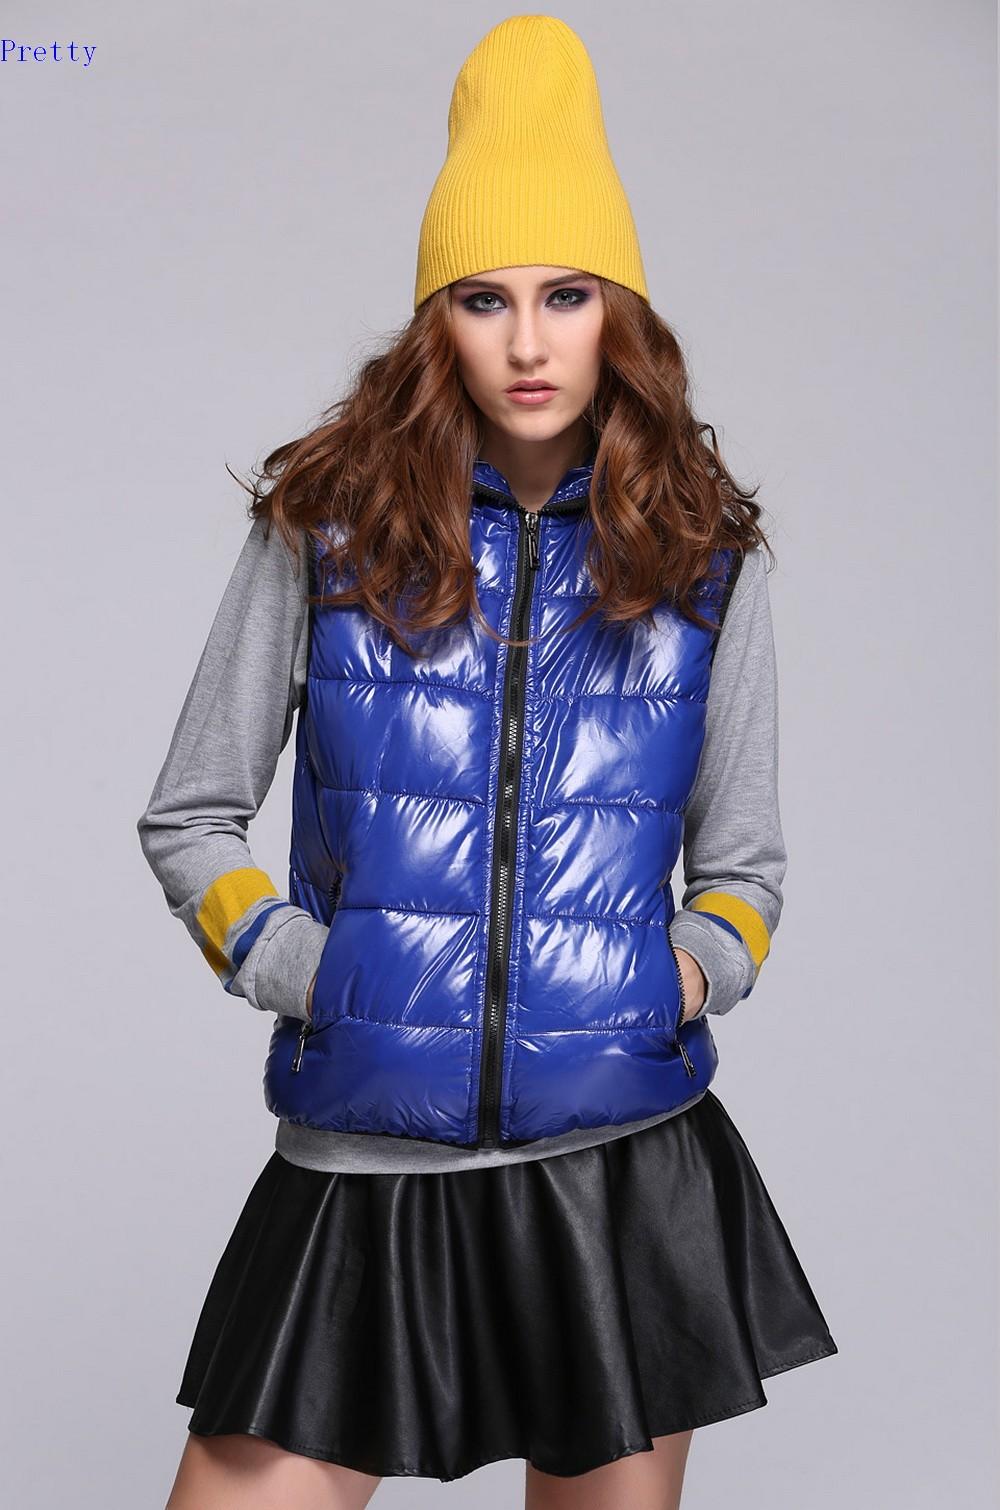 new 2014 spring Waterproof Women's casual vest Lady colorful waistcoat plus size XXXL sleeveless jacket fashoin 24(China (Mainland))